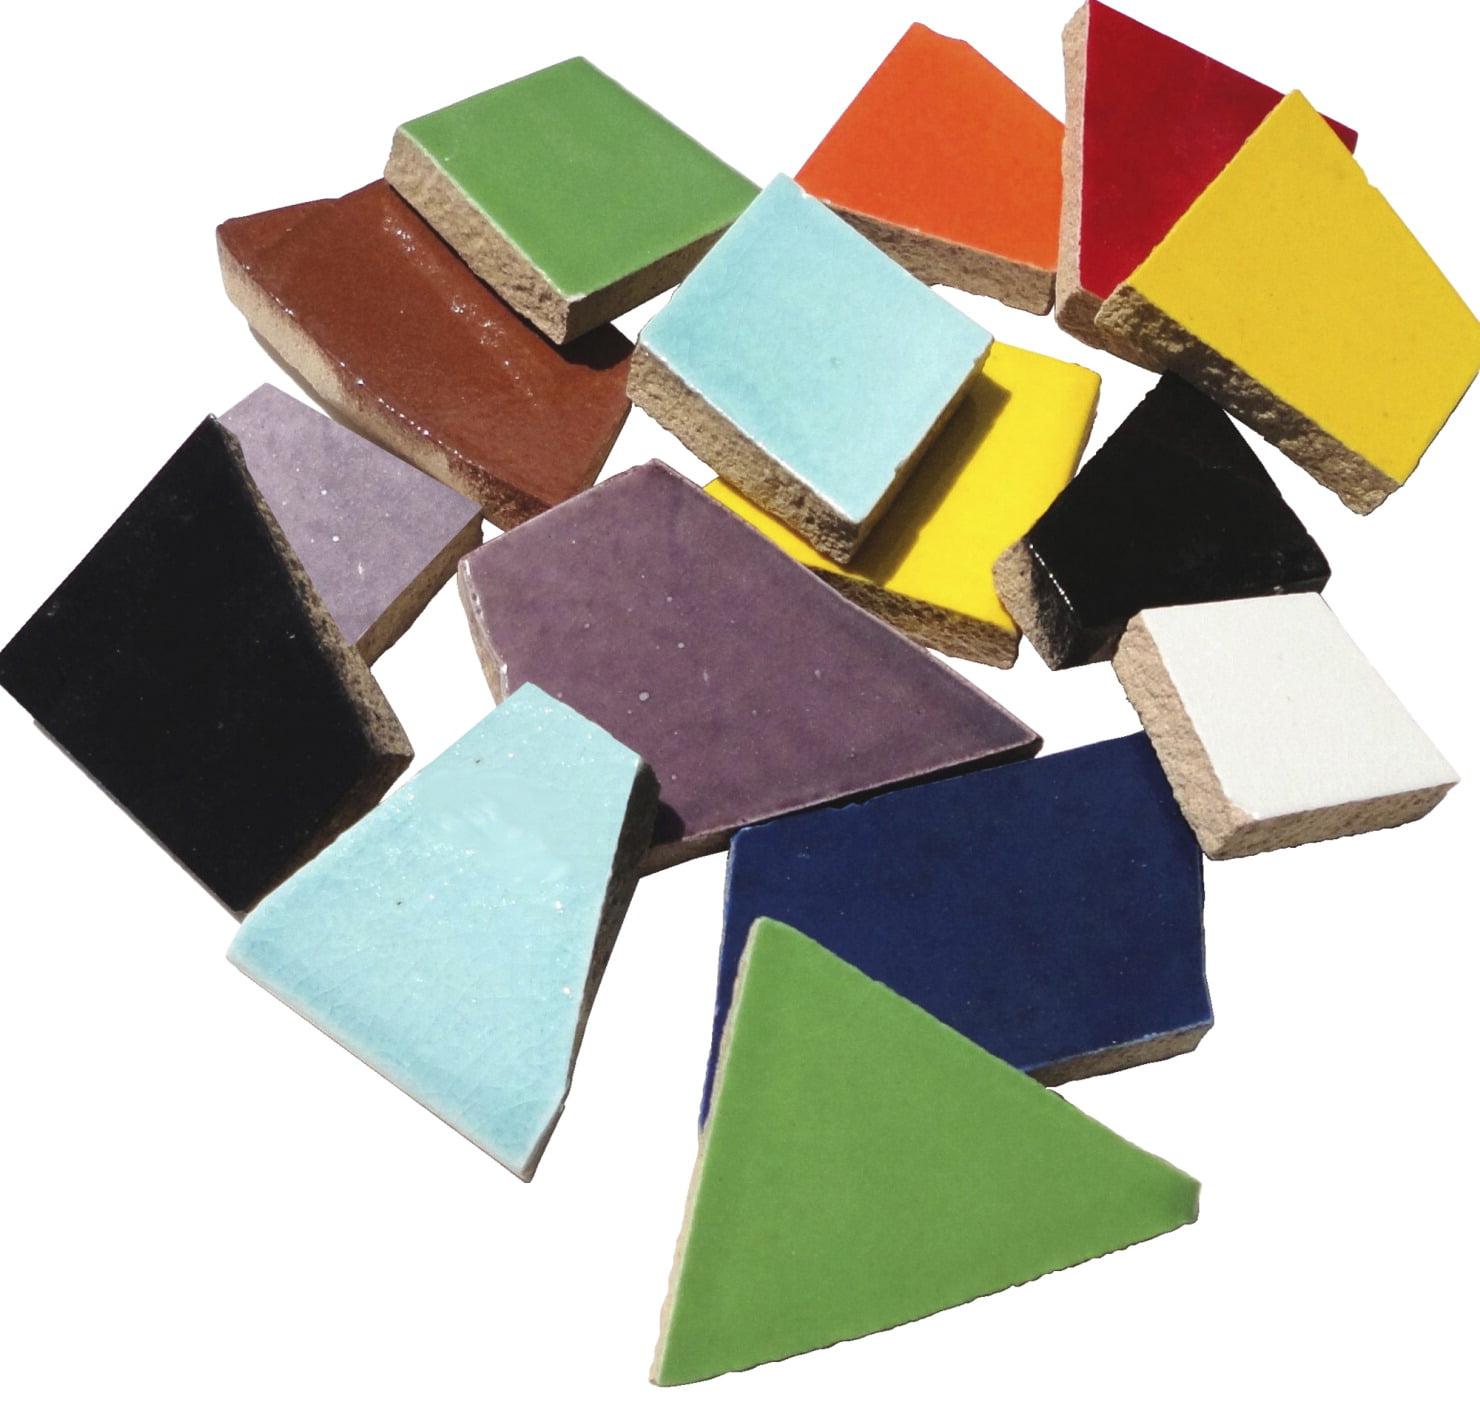 Mosaic Mercantile Ceramic Crafters Cut, Assorted Colors, 1 lb